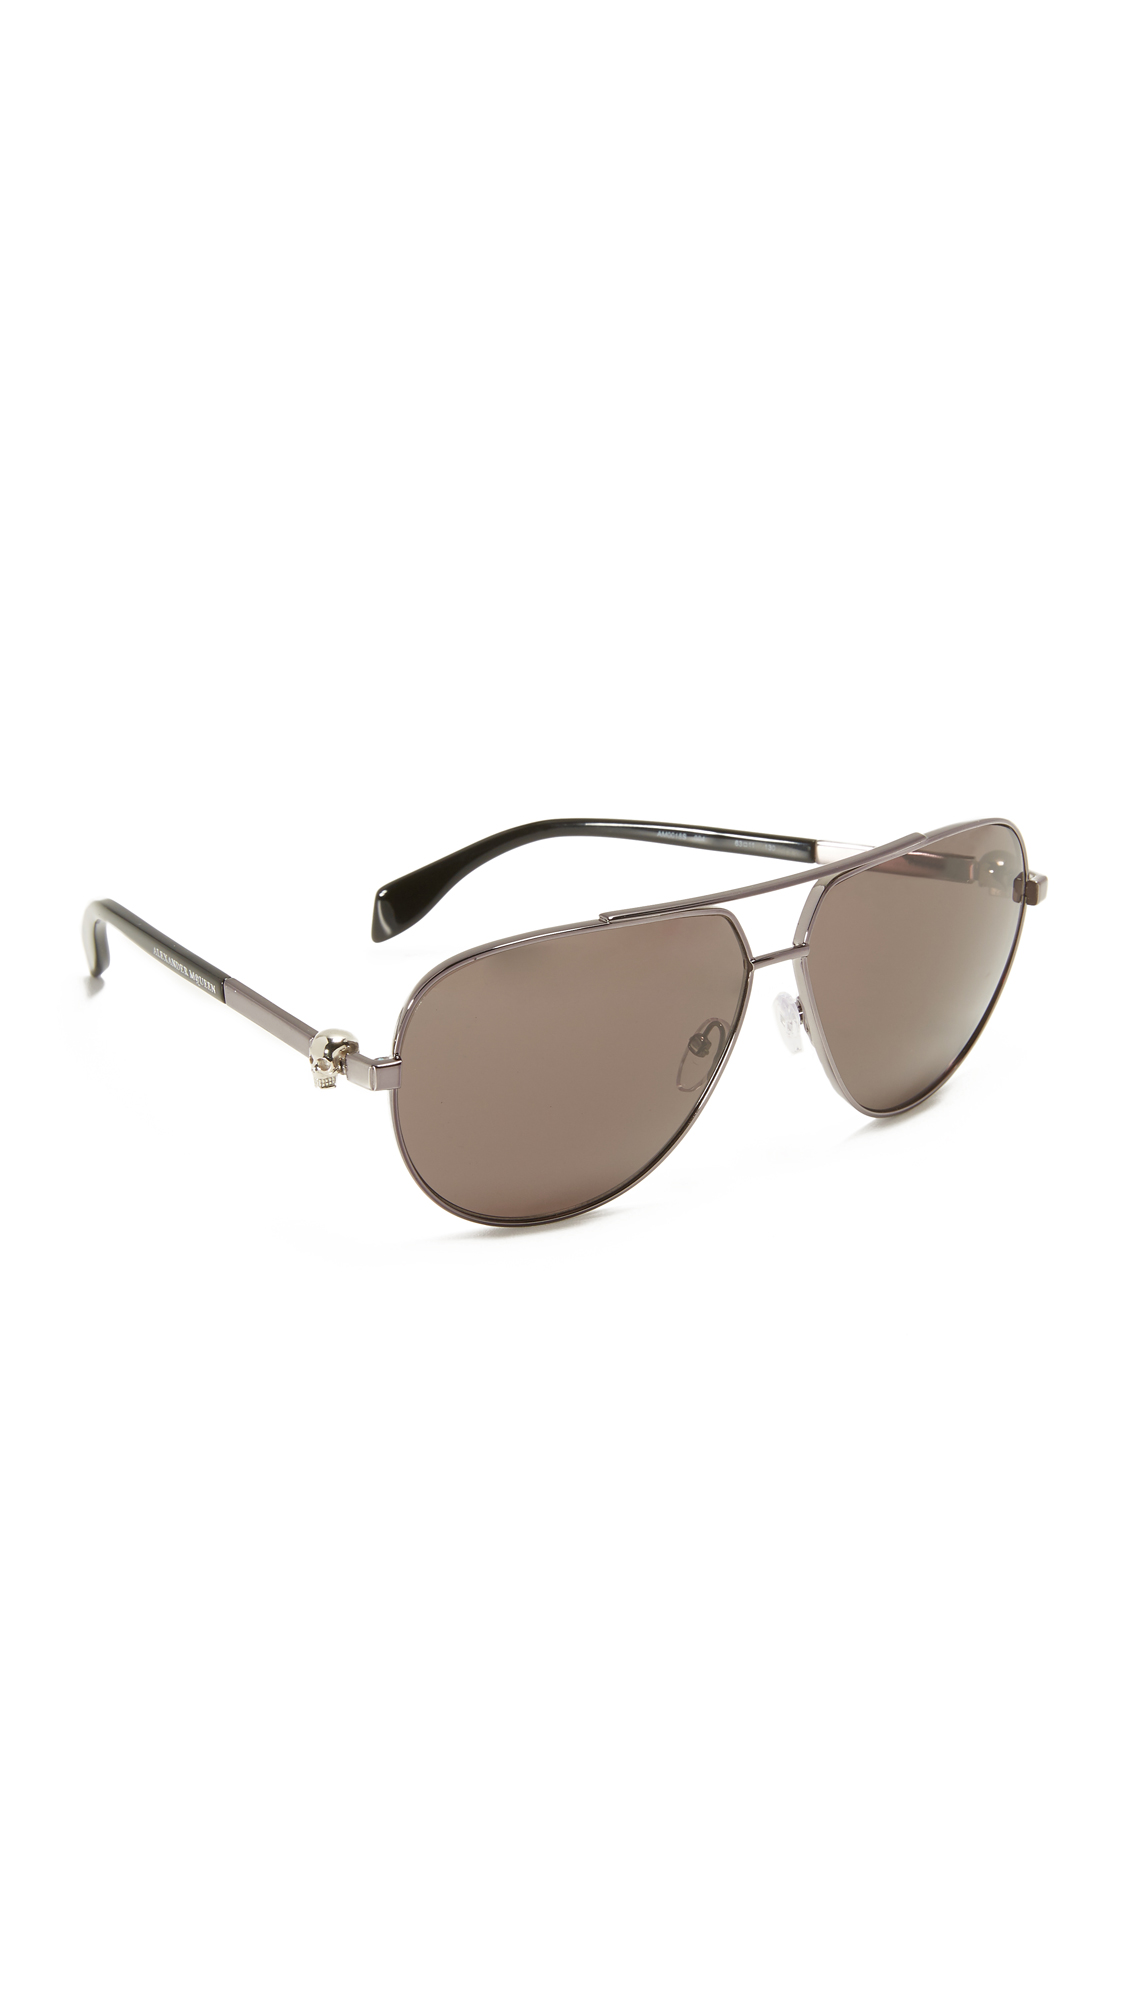 5d0aa9cc21576 Alexander McQueen Skull Aviator Sunglasses